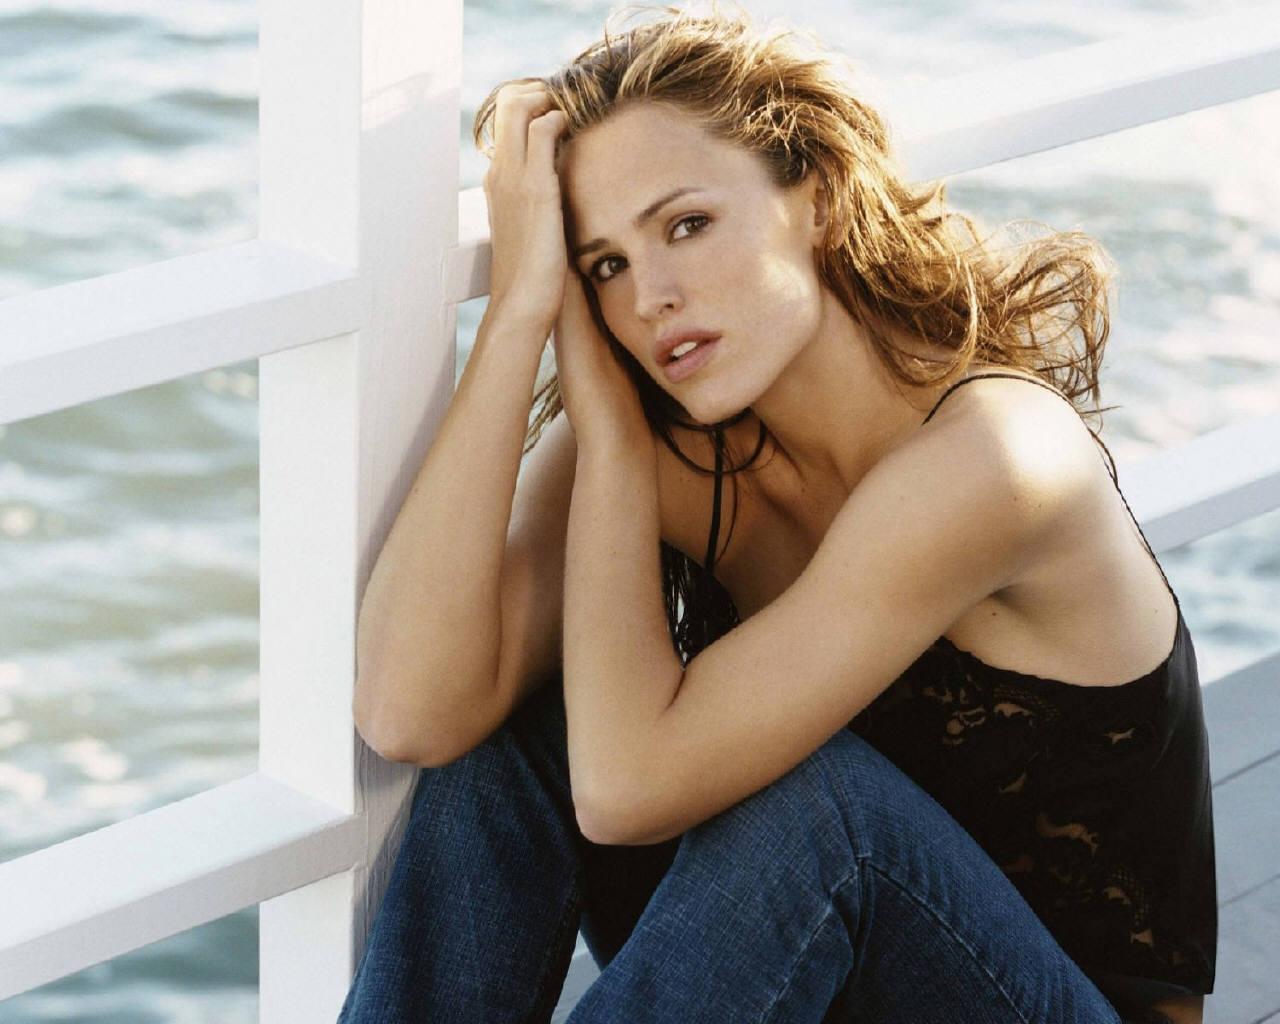 Jennifer Garner Wide wallpapers